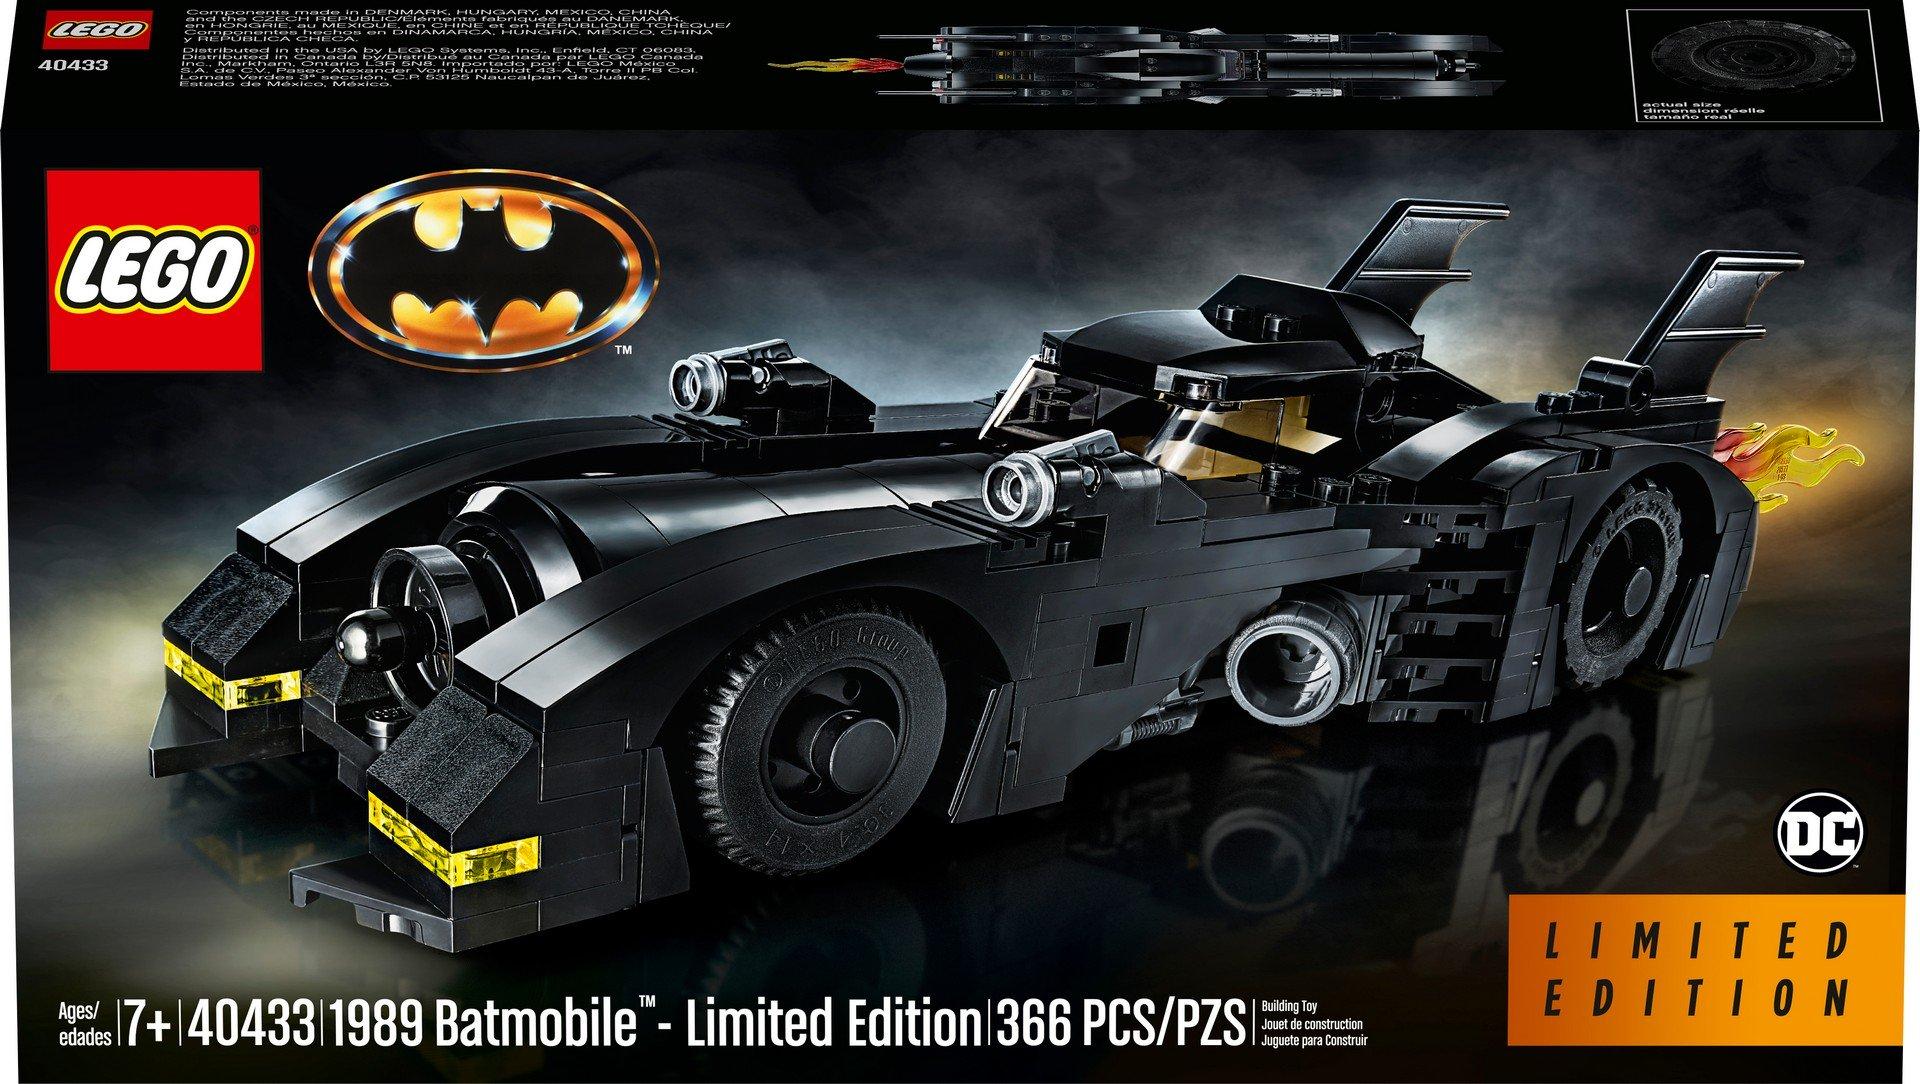 Lego-Batmobile-kit-1989-14